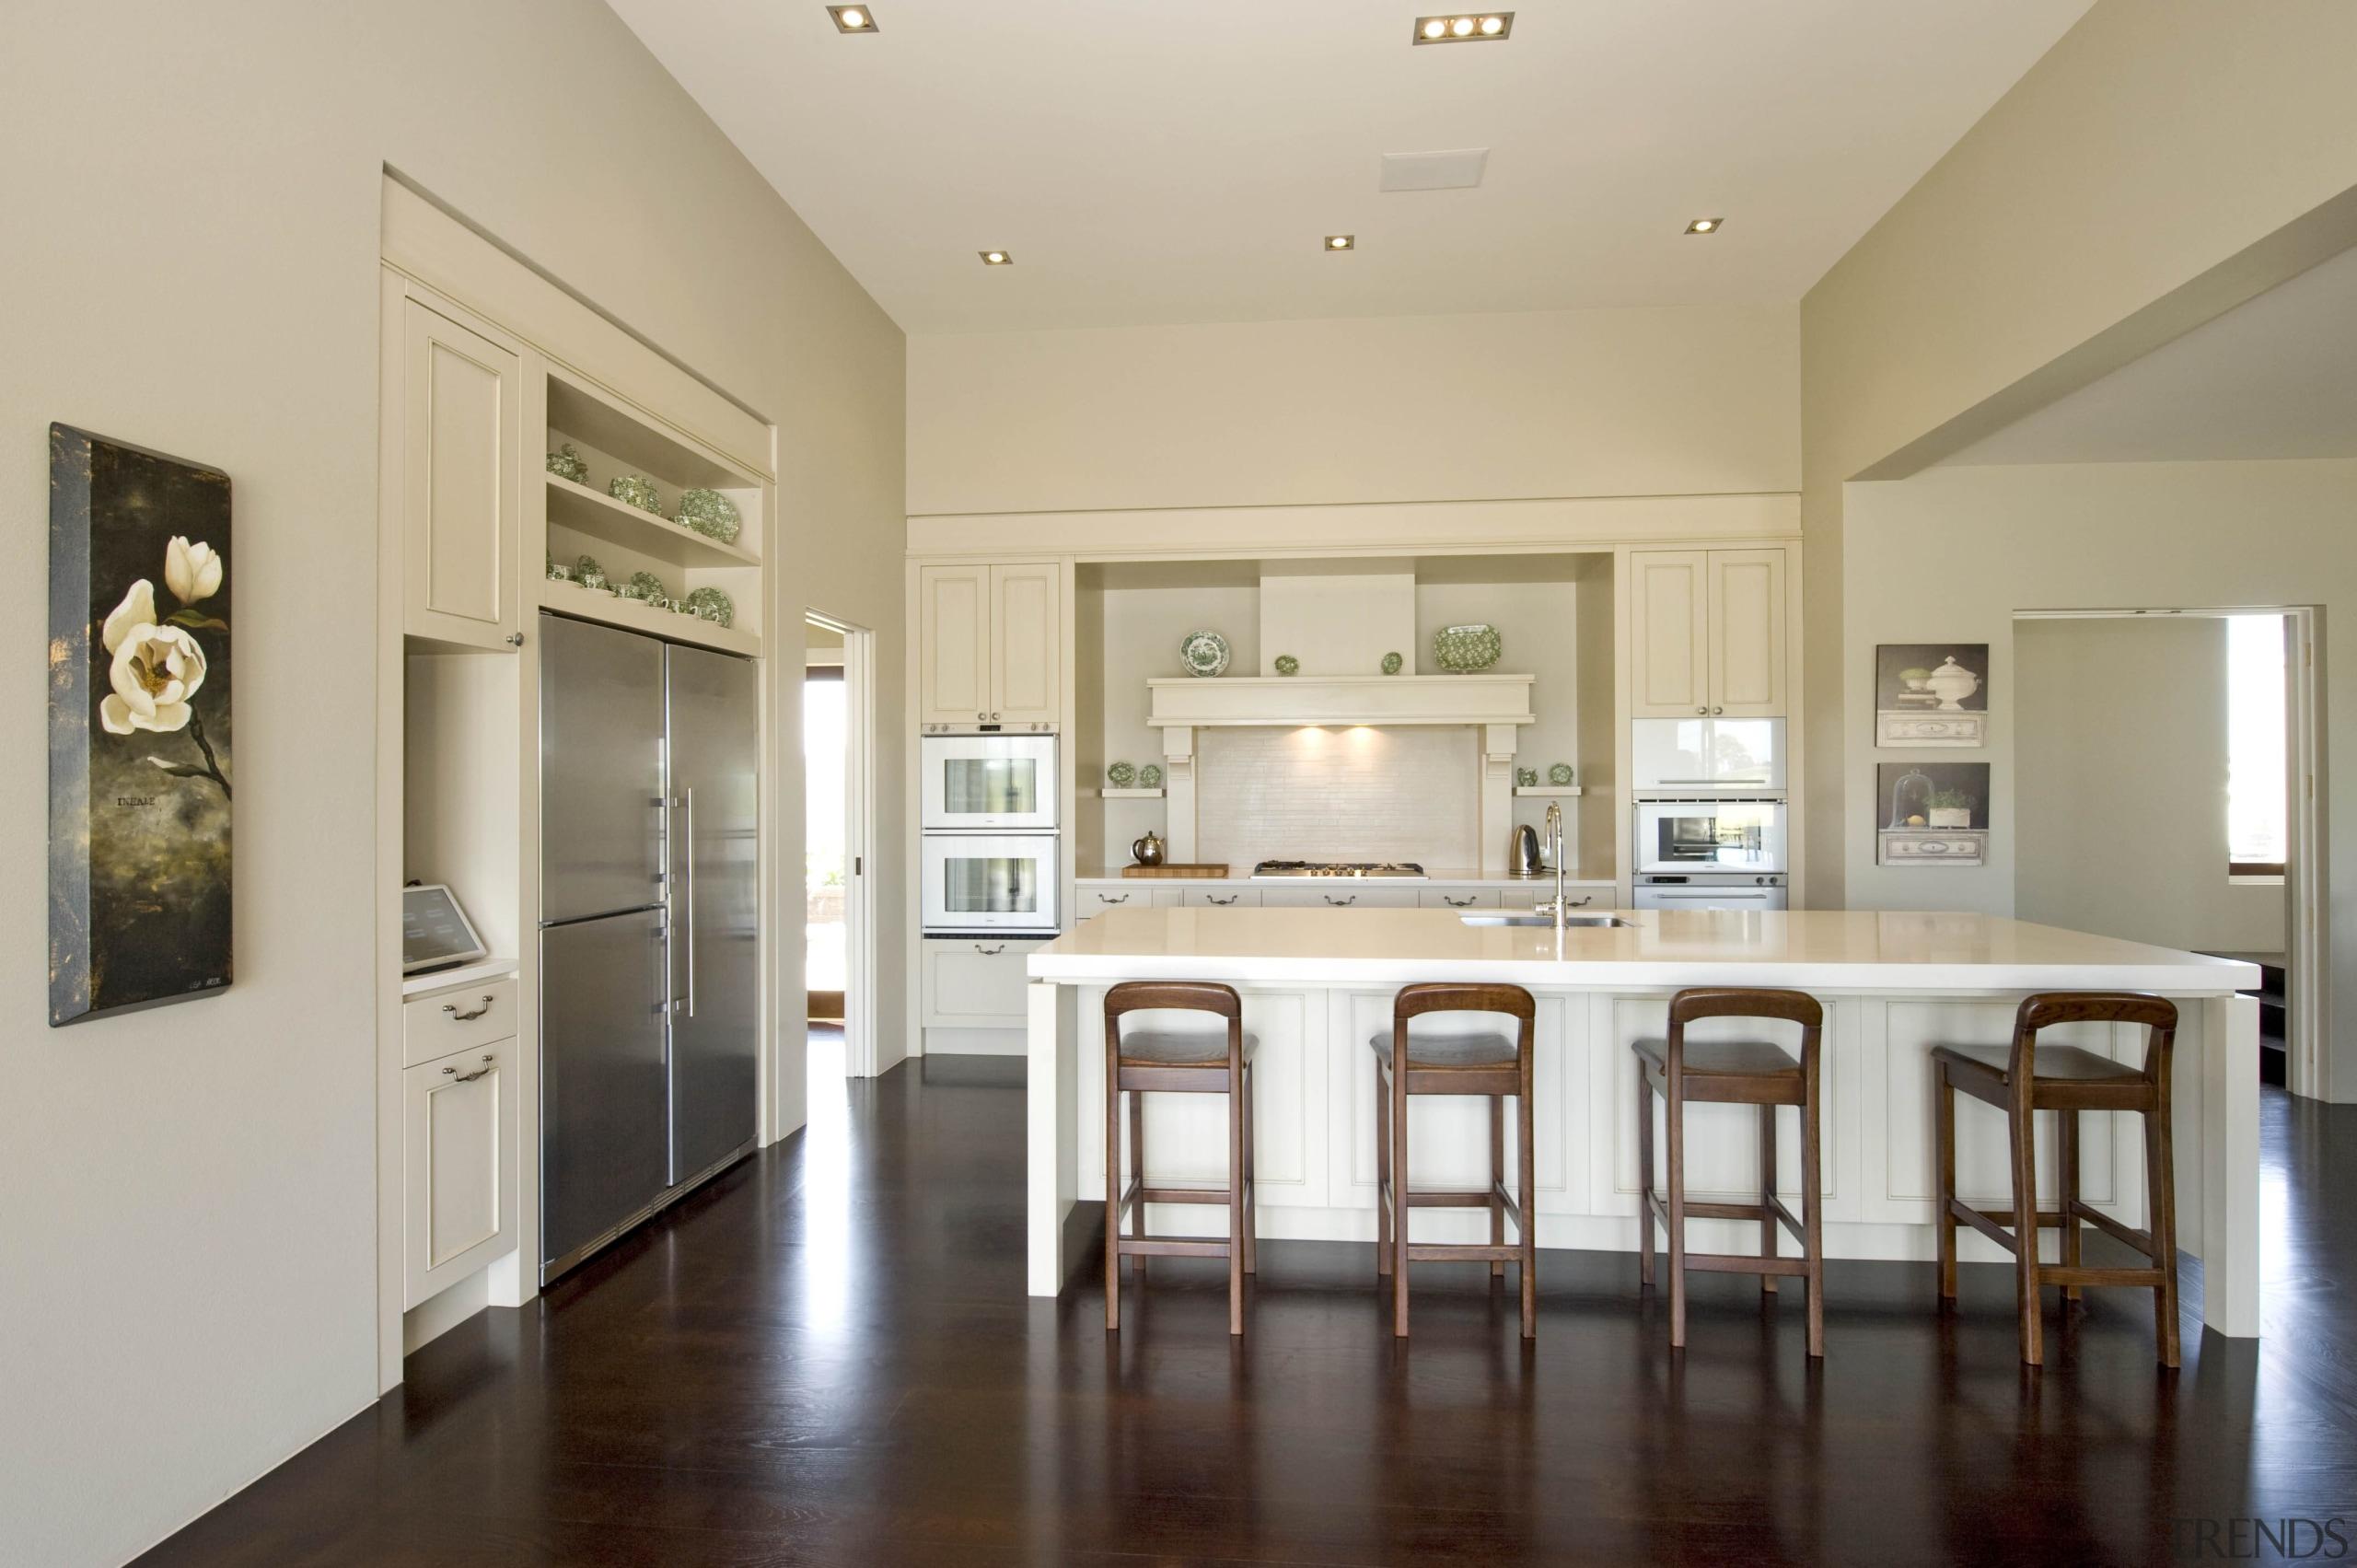 Karaka - ceiling | countertop | cuisine classique ceiling, countertop, cuisine classique, dining room, estate, floor, flooring, hardwood, home, interior design, kitchen, property, real estate, room, wood flooring, gray